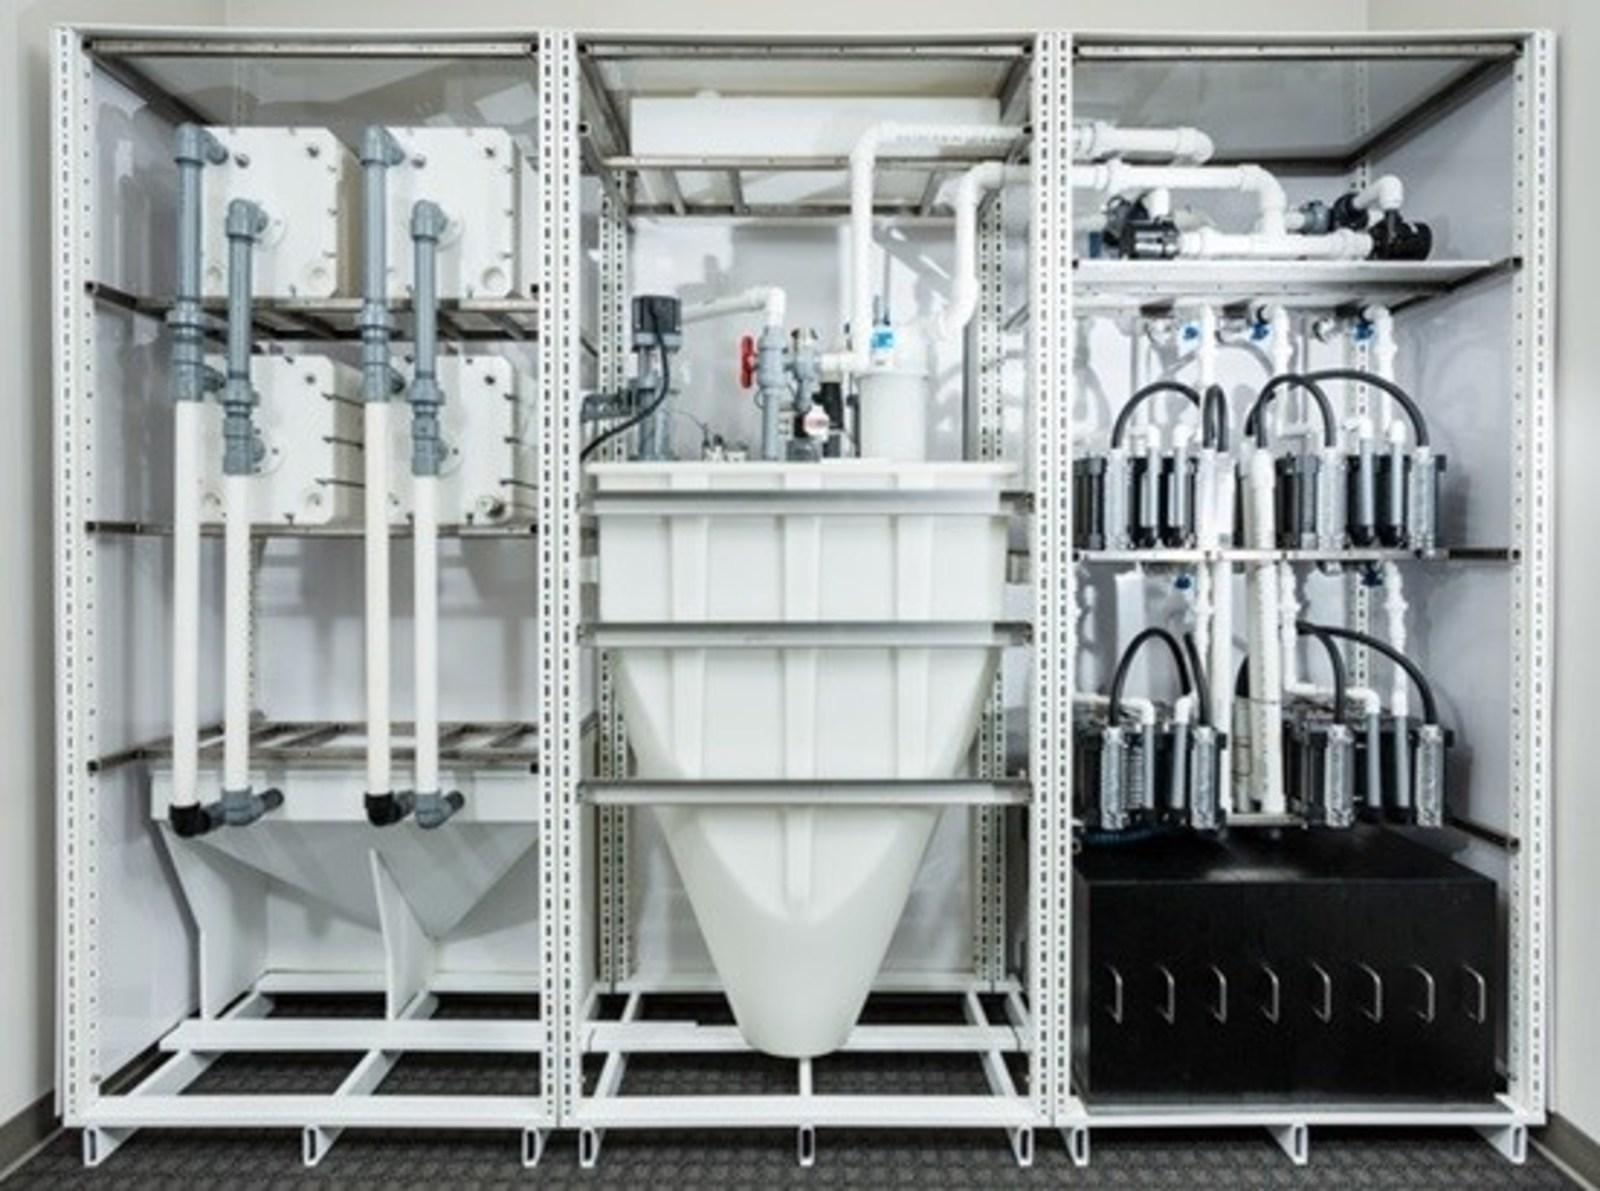 Figure 2. MGXR modular Energy Storage System